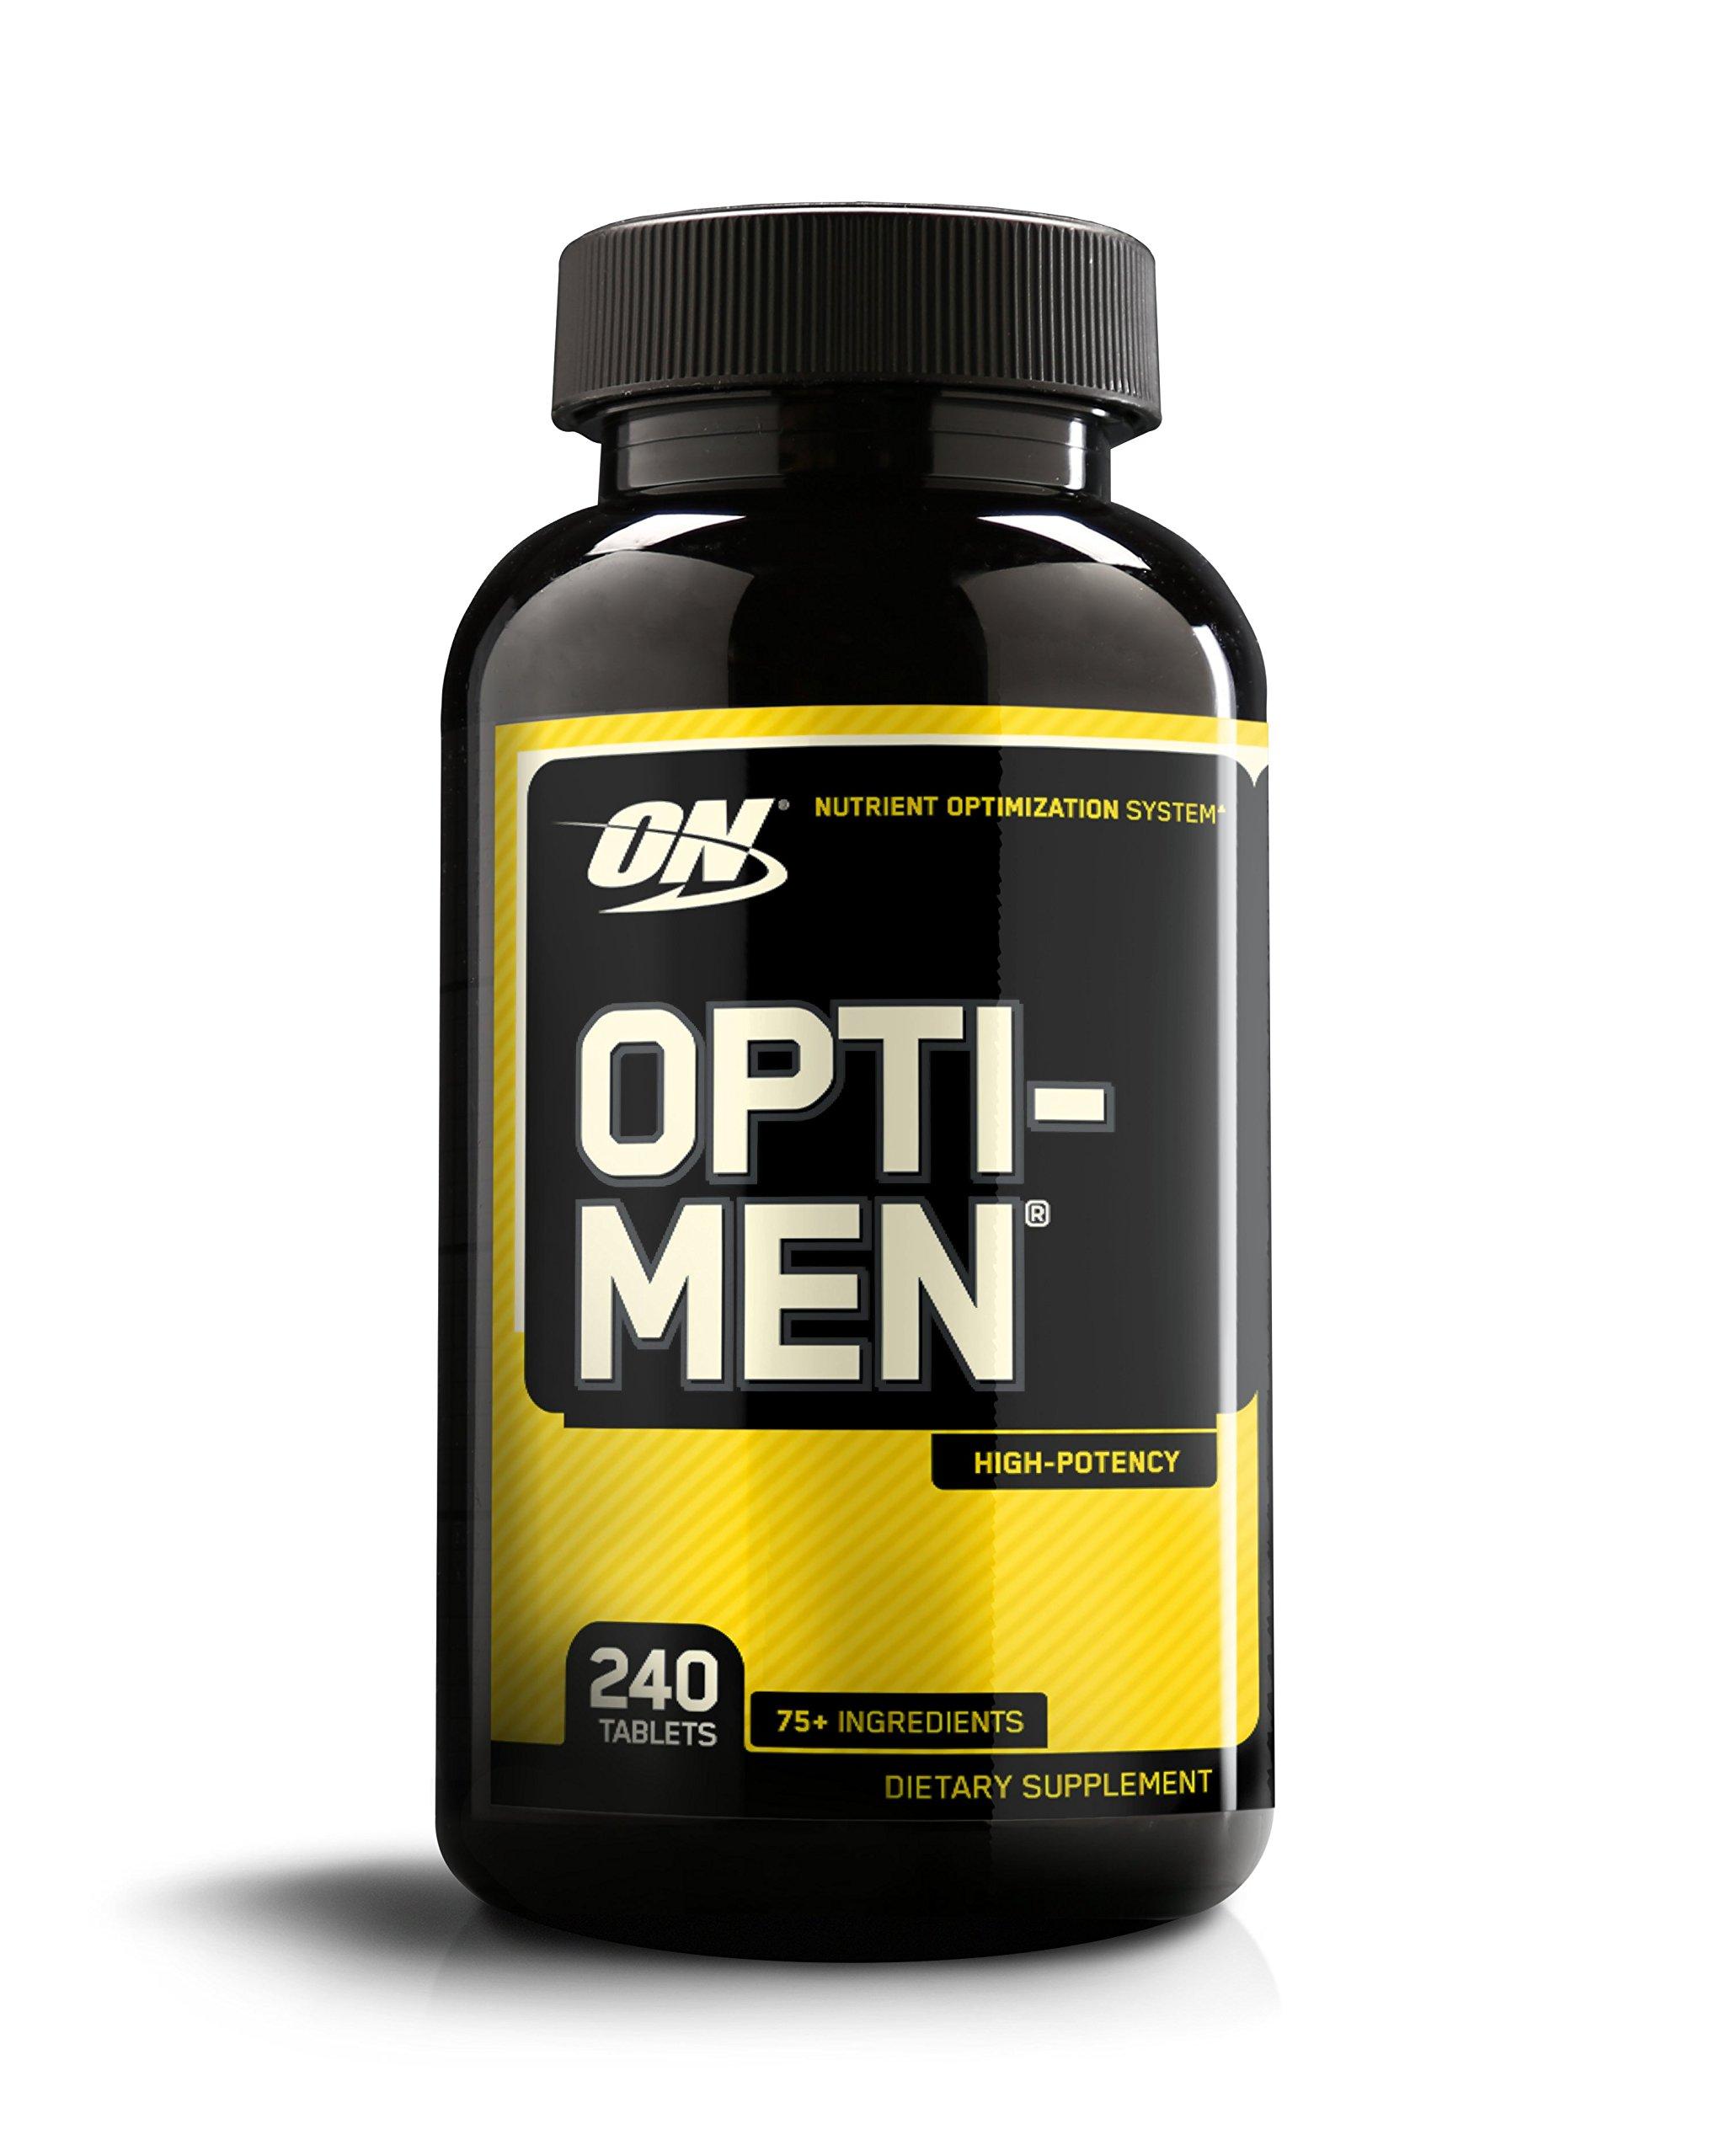 Optimum Nutrition Opti-Men, Mens Daily Multivitamin Supplement with Vitamins C, D, E, B12, 240 Count